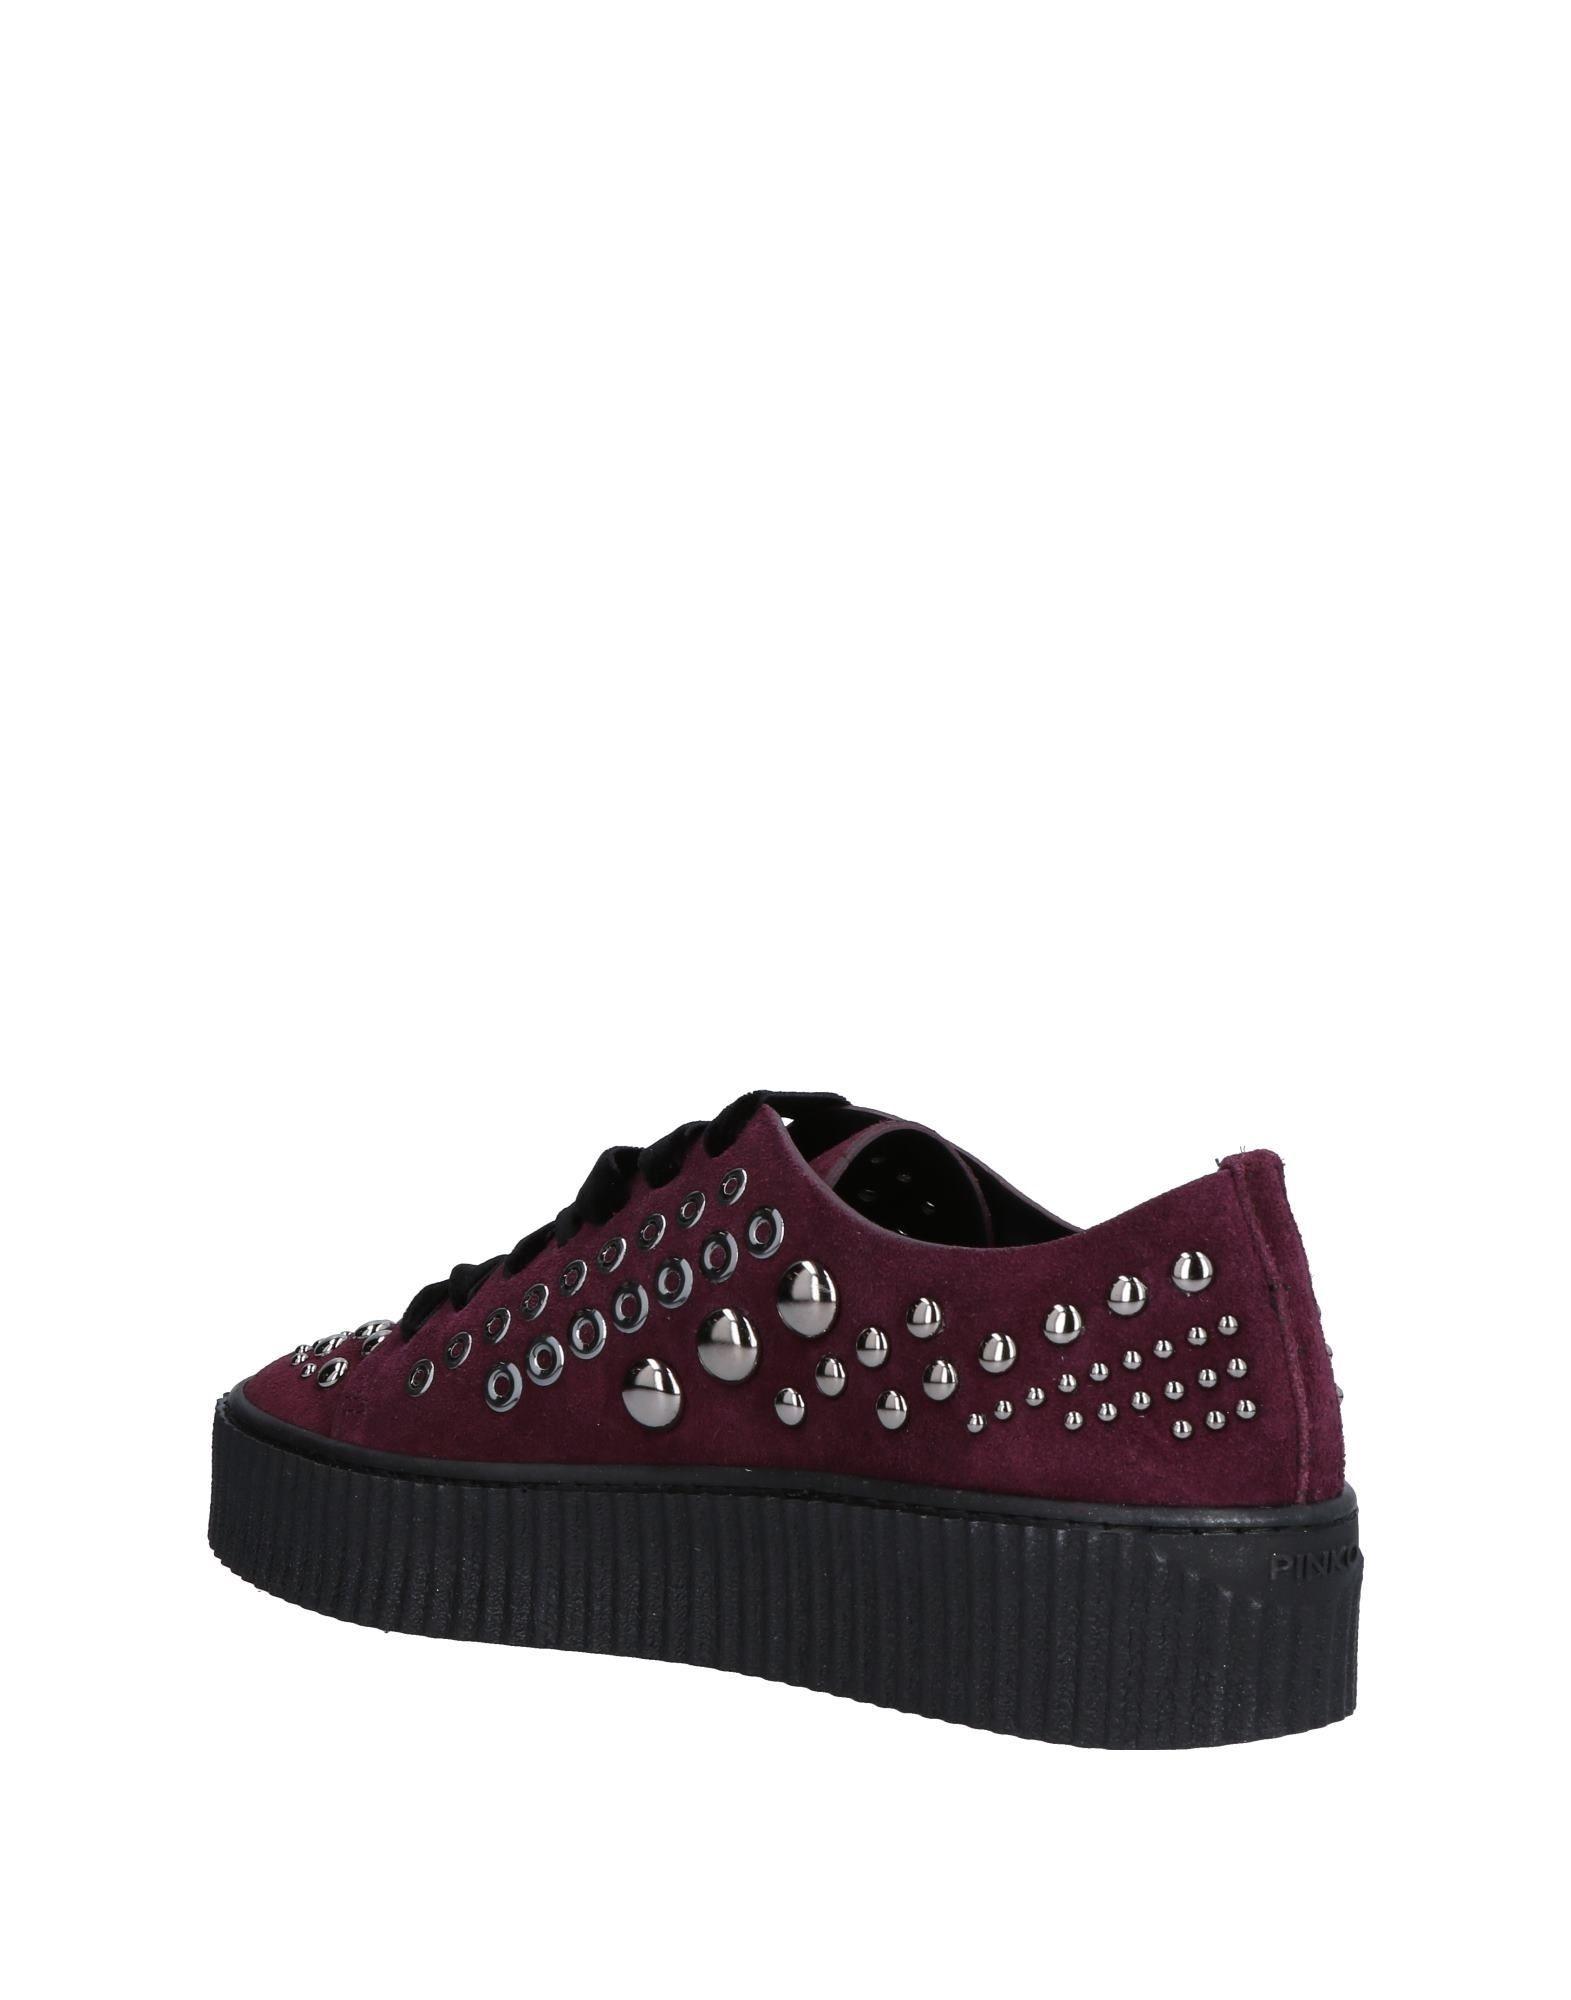 Pinko Deep Purple Leather Studded Sneakers